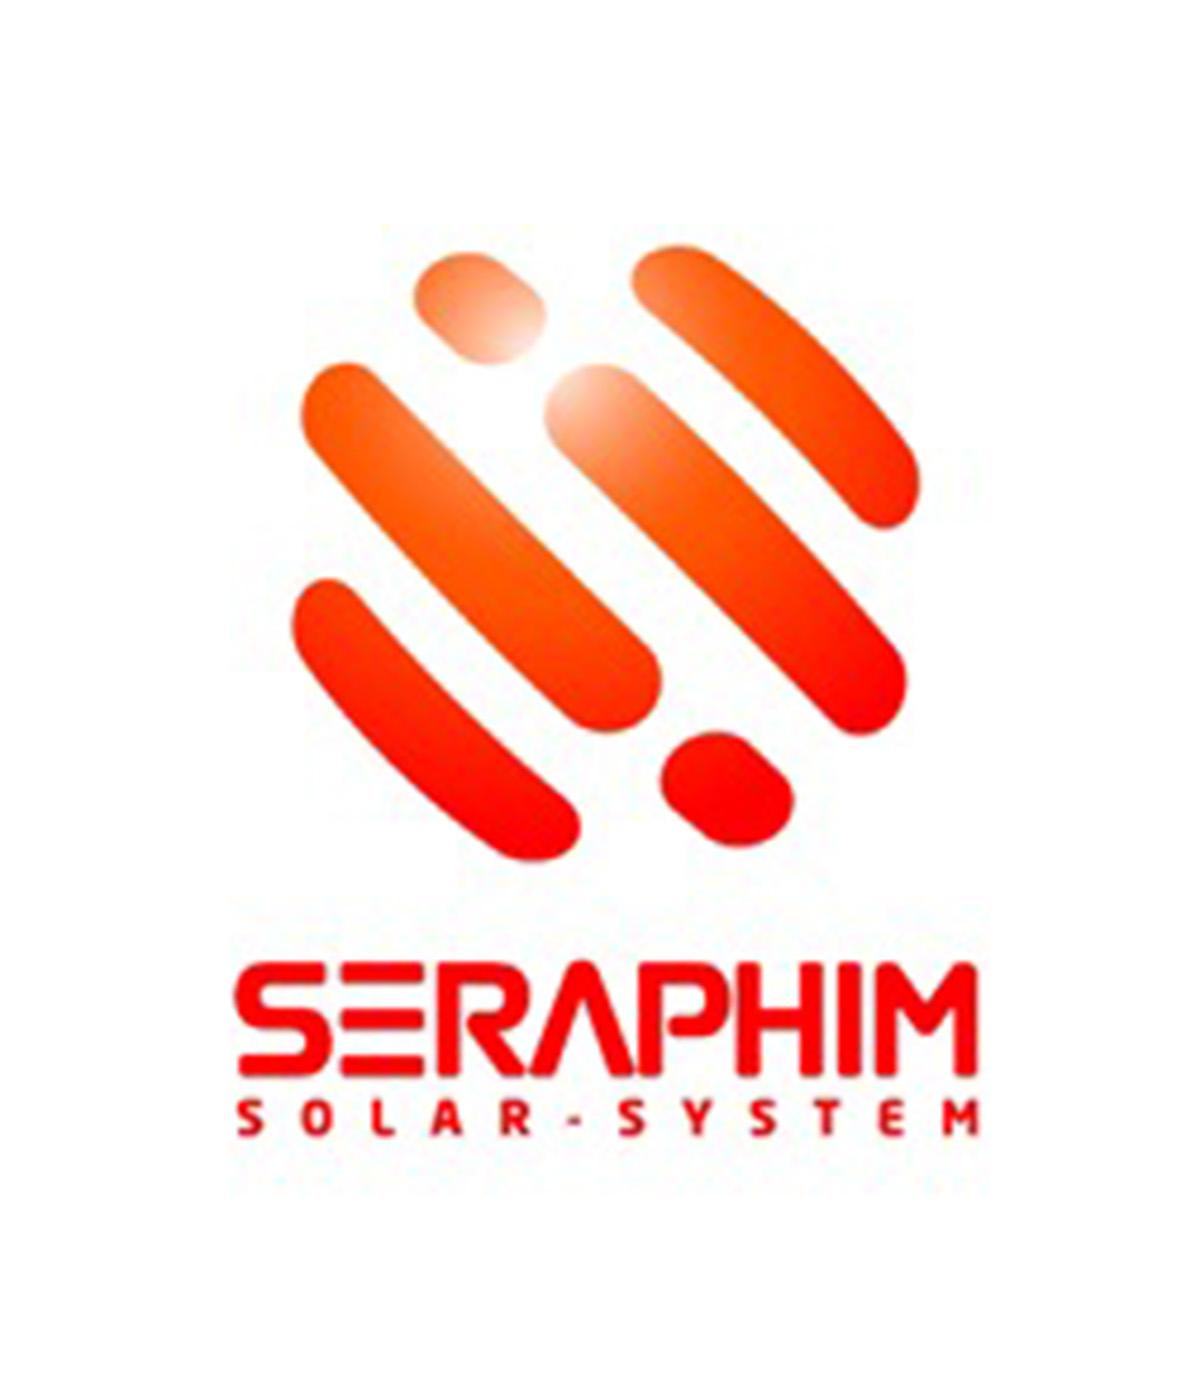 Seraphim-1200